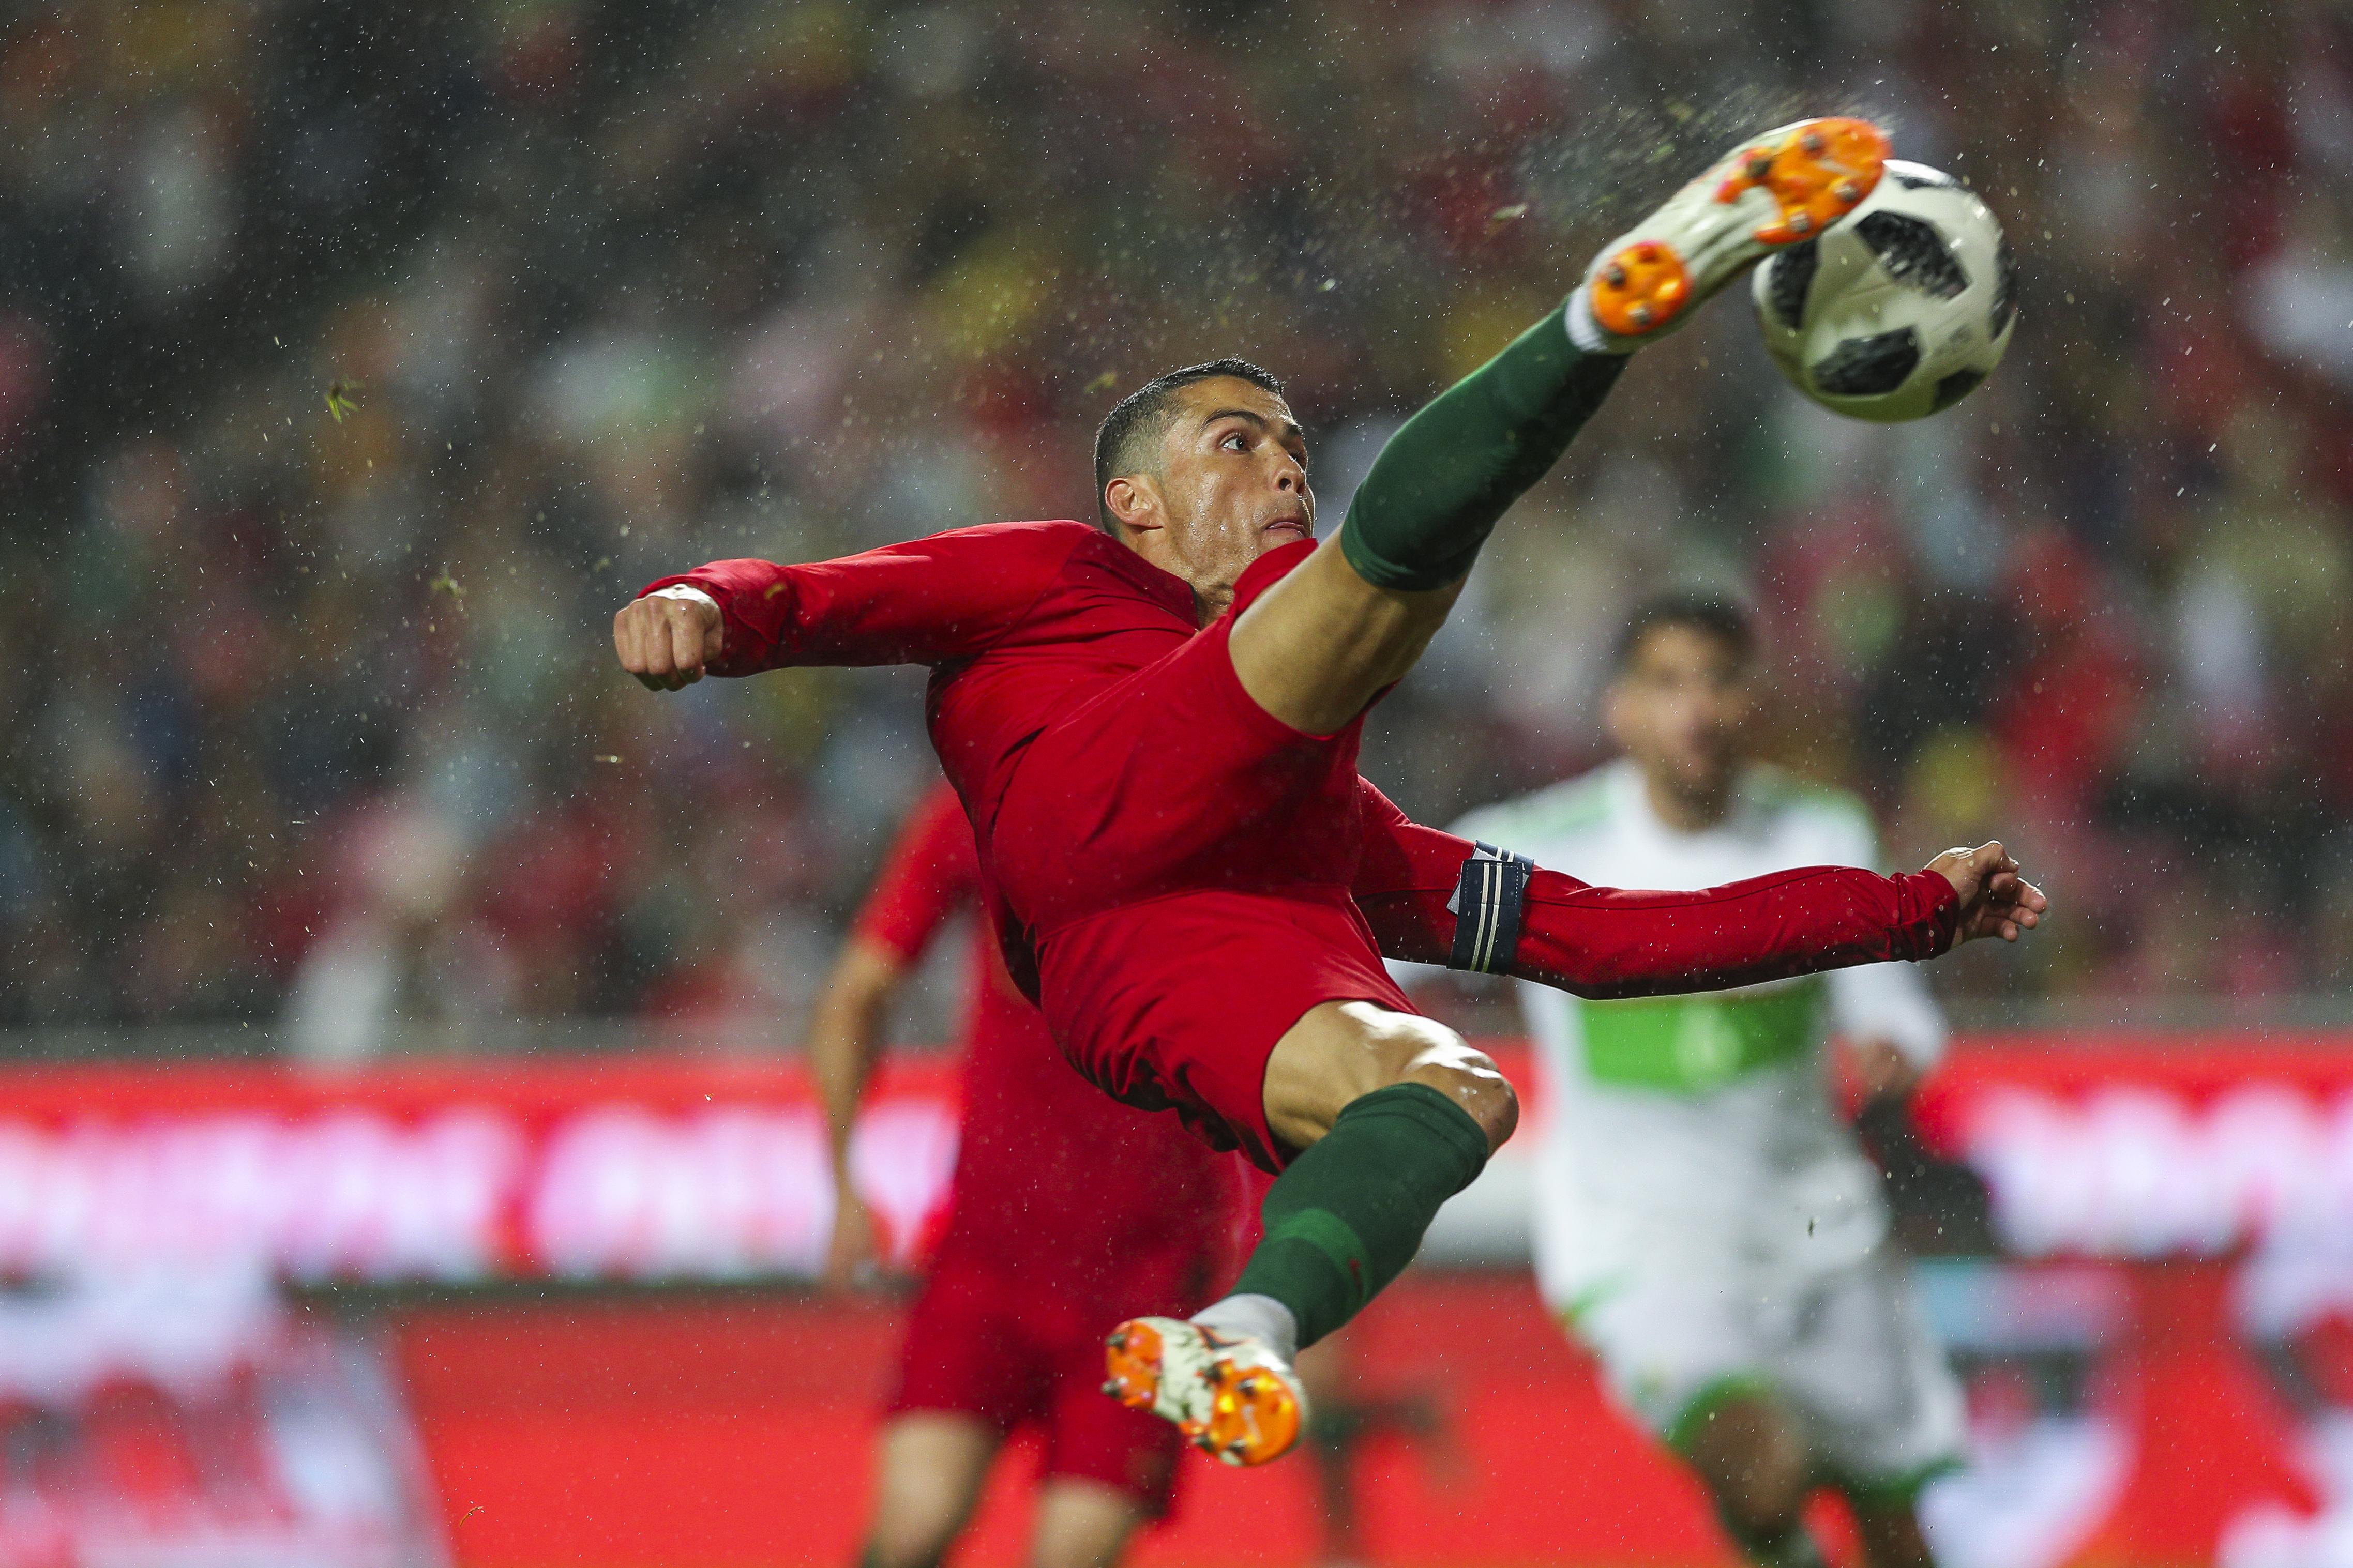 Cristiano Ronaldo kicking soccer ball